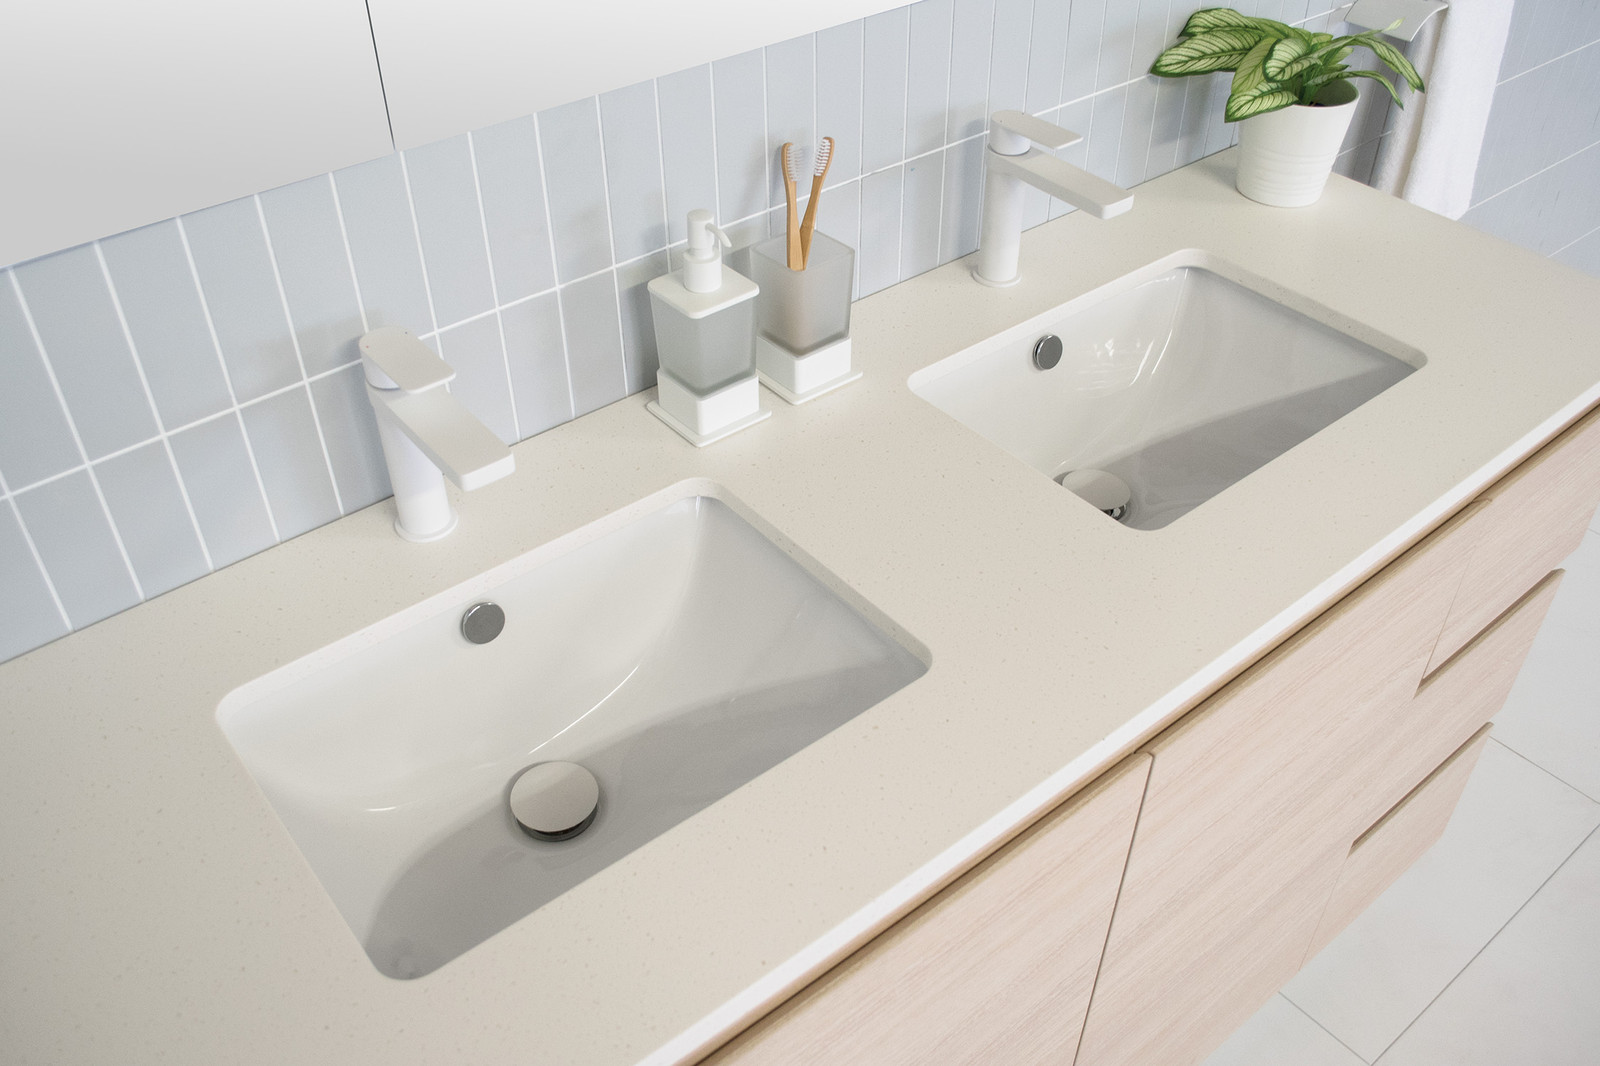 Glacier Quartz Vanity Architectural Designer Products